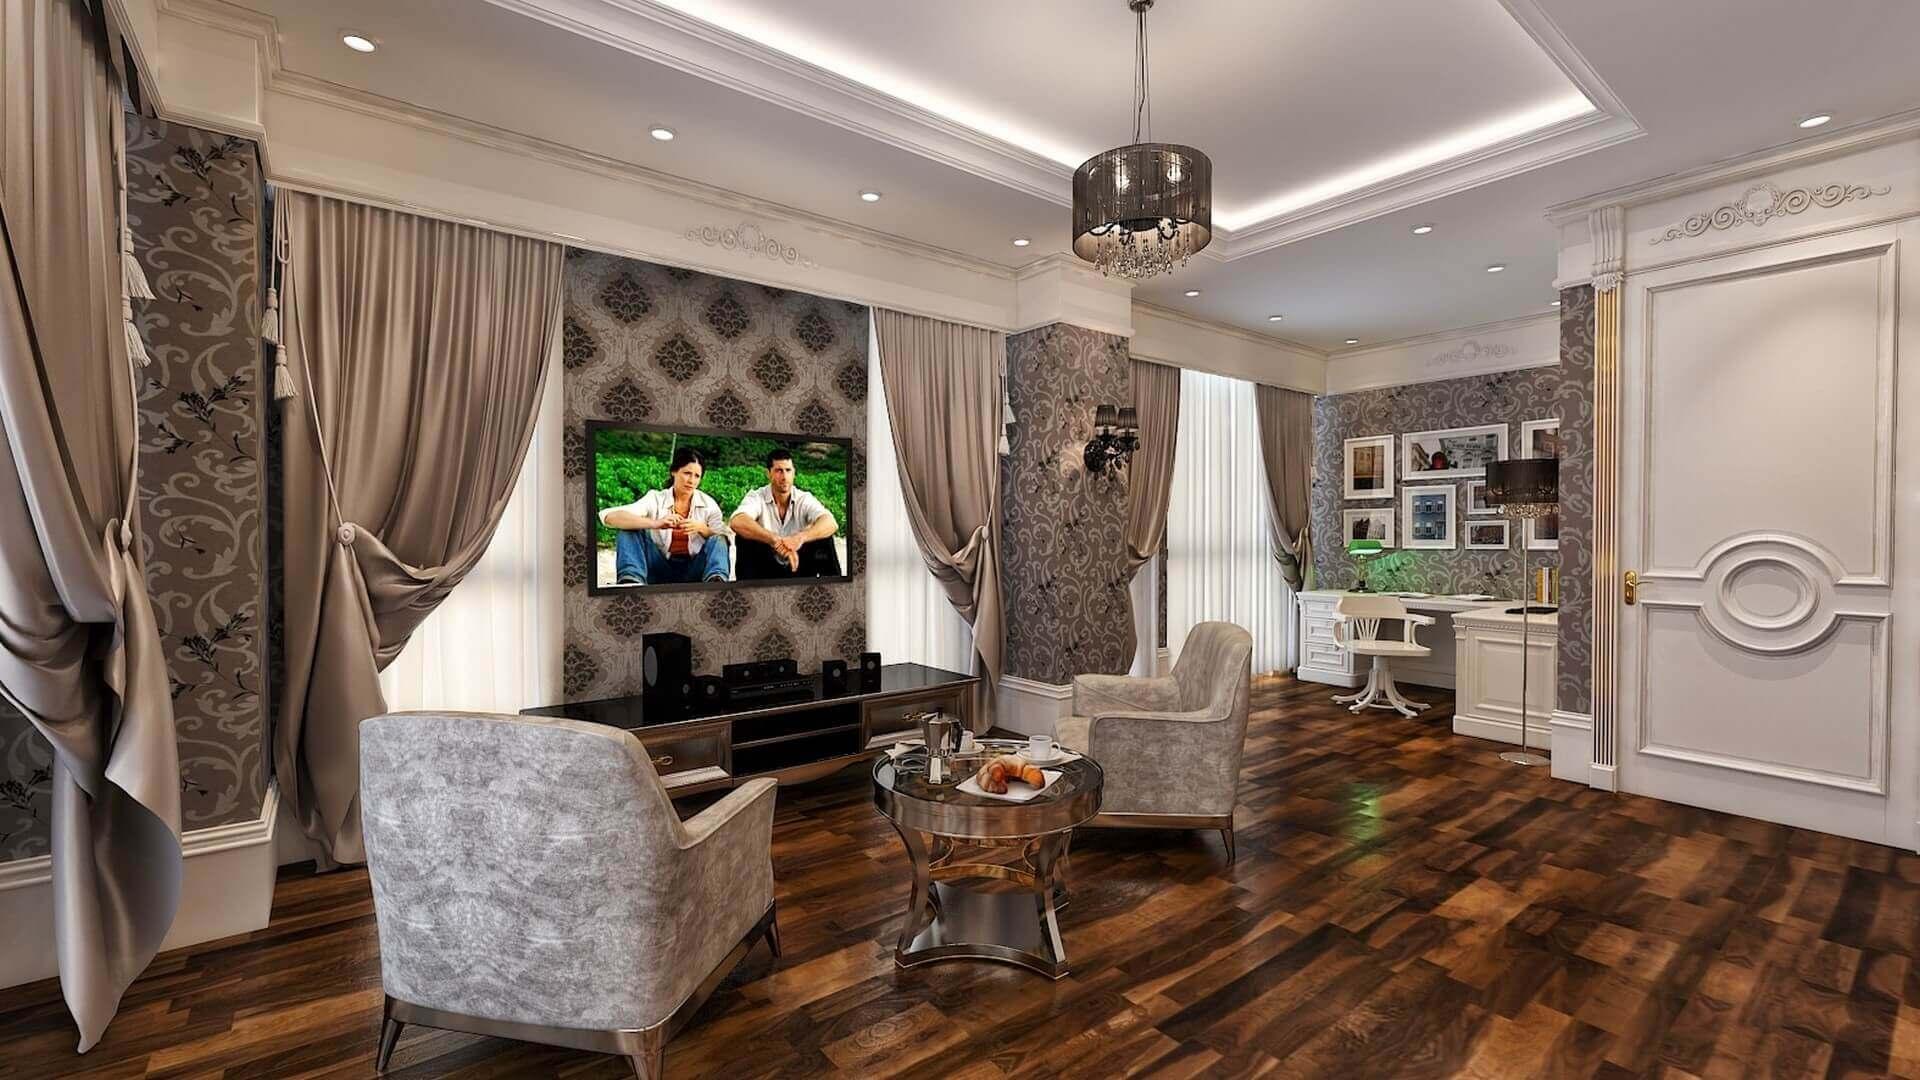 Vantage umitkoy interior designer 2791 Private Project Residential